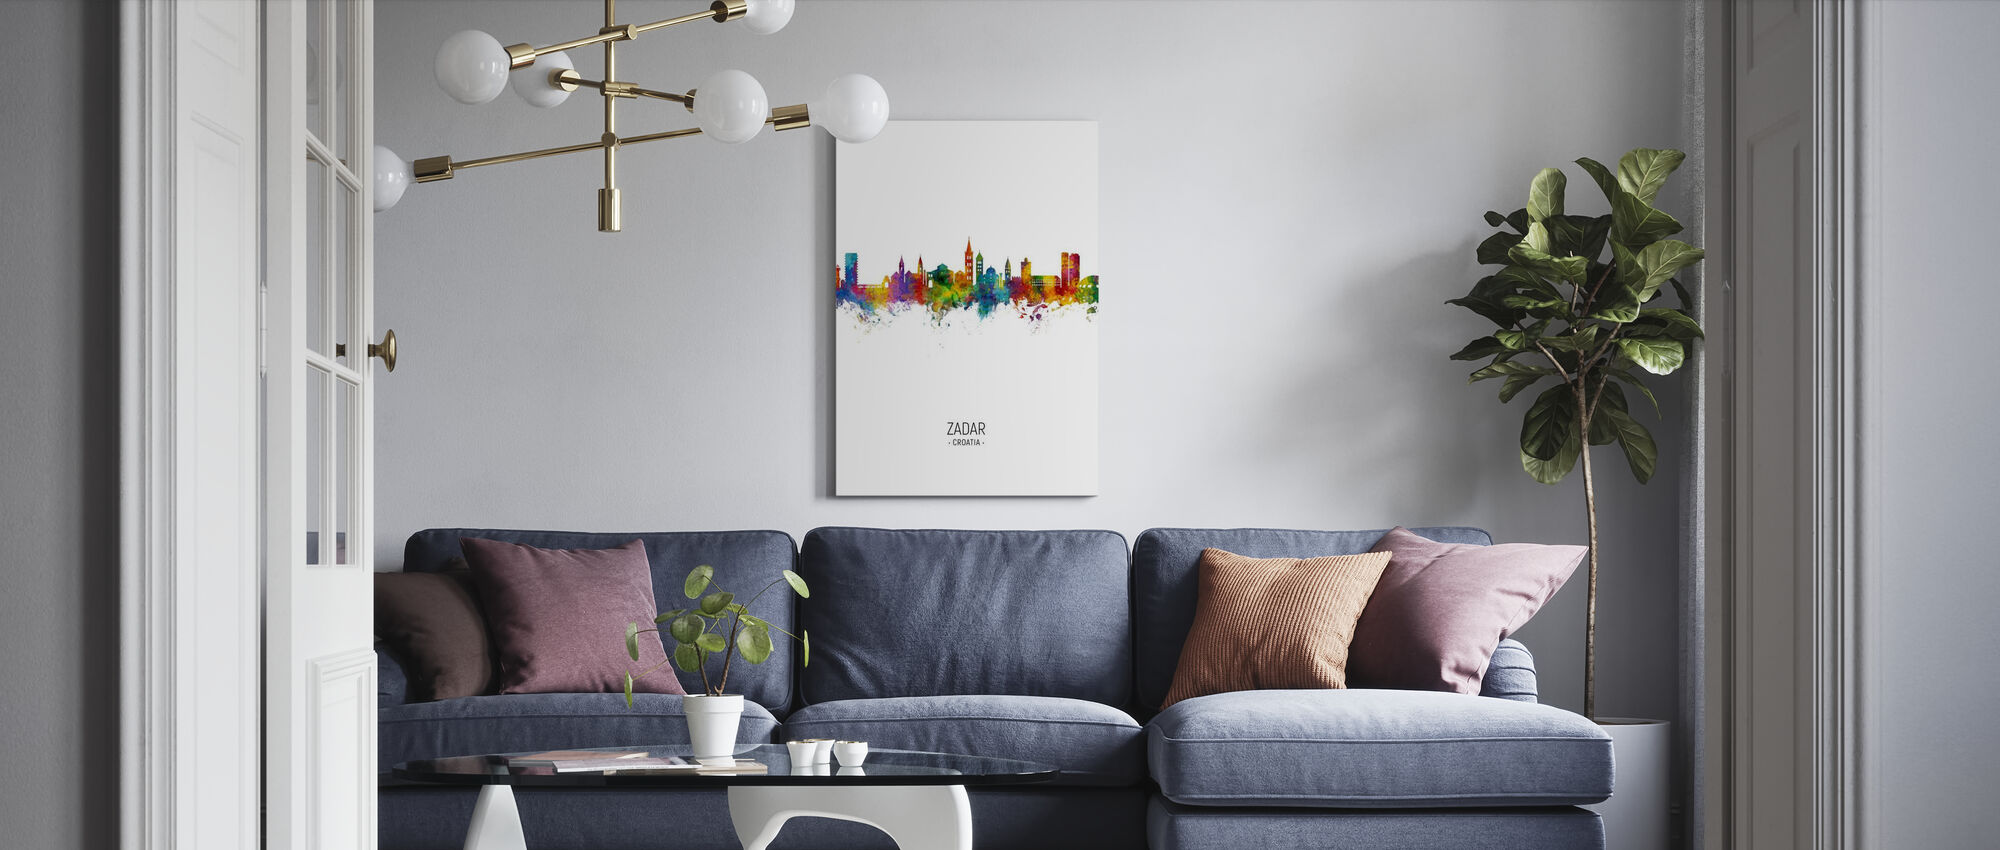 Zadar Croatia Skyline - Canvas print - Living Room